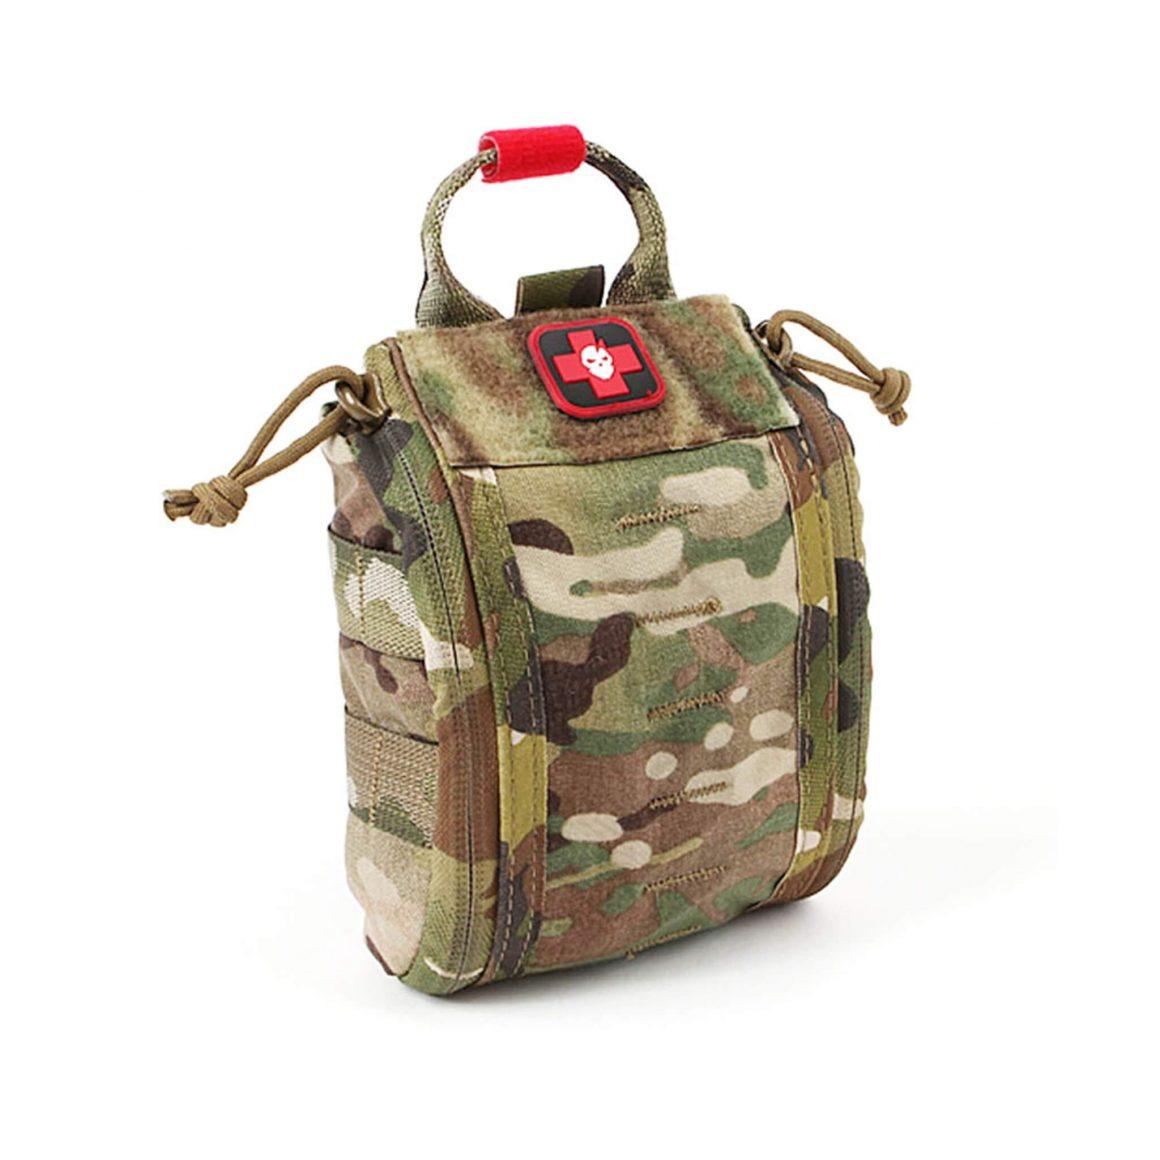 Imminent Threat Solutions ITS ETA Trauma Kit Pouch (Fatboy)